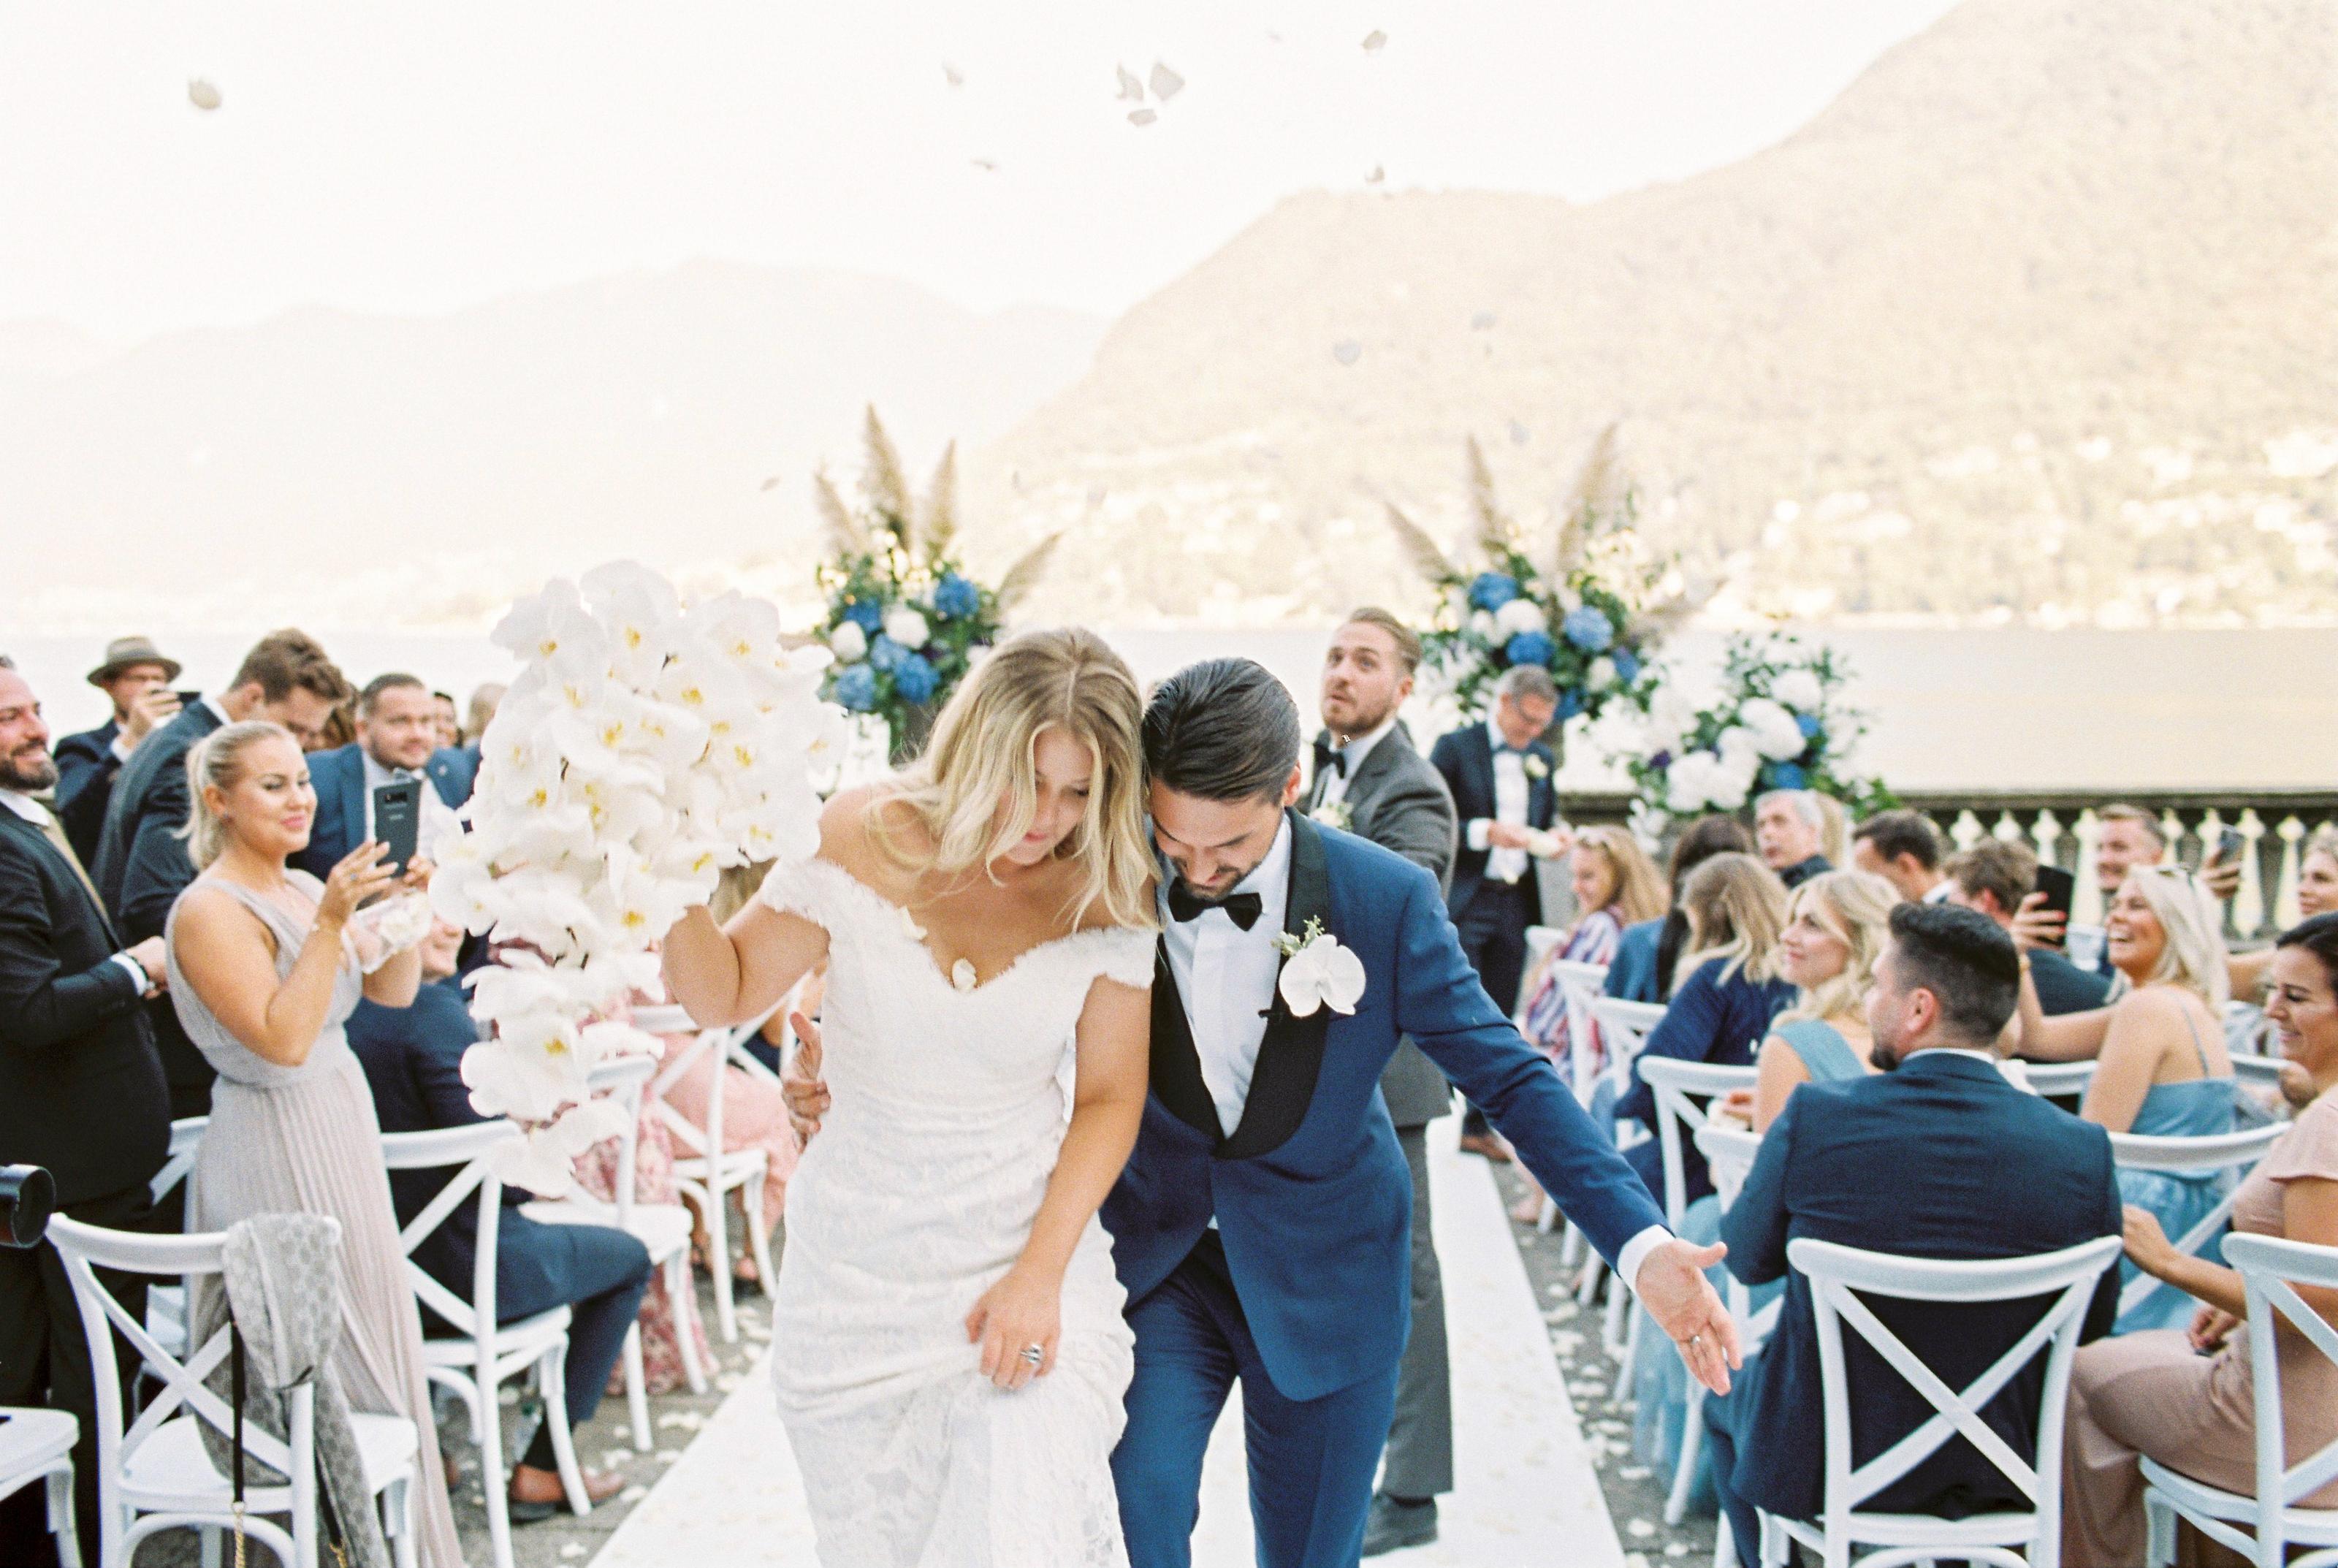 2 BridesPhotography_Molimenti_Wedding_37